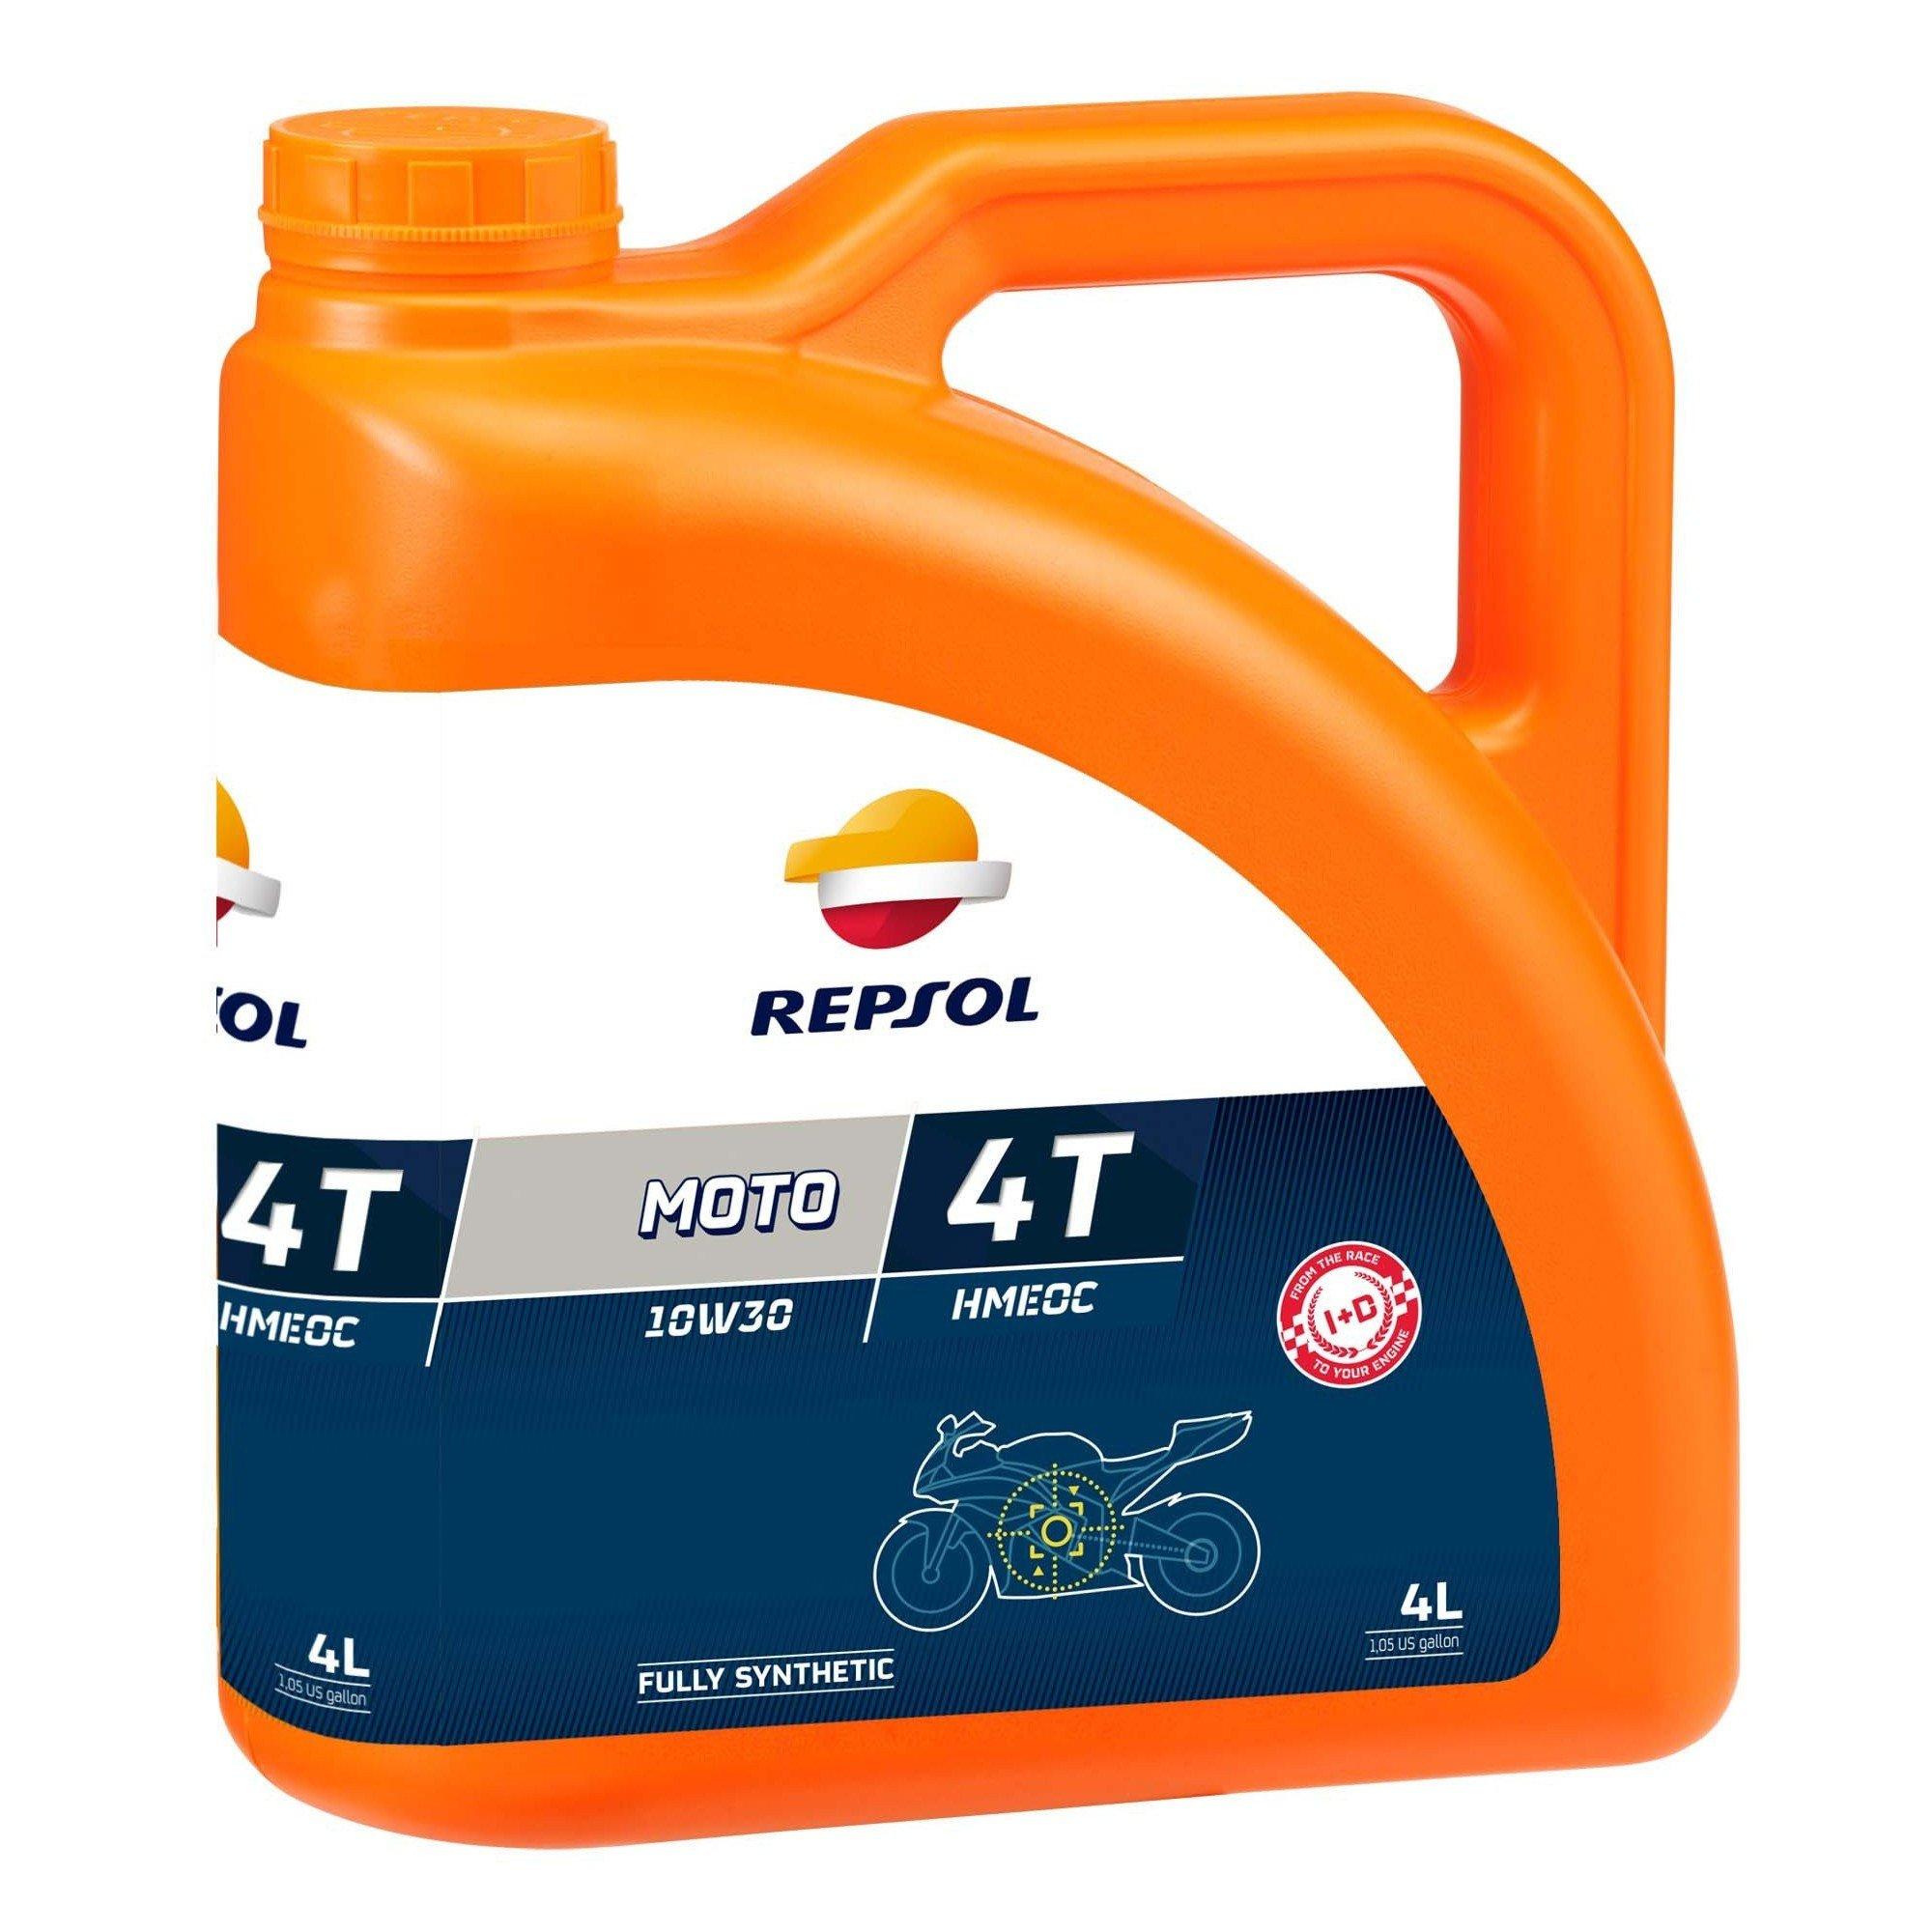 Repsol Moto HMEOC 4T 10W30, 4L